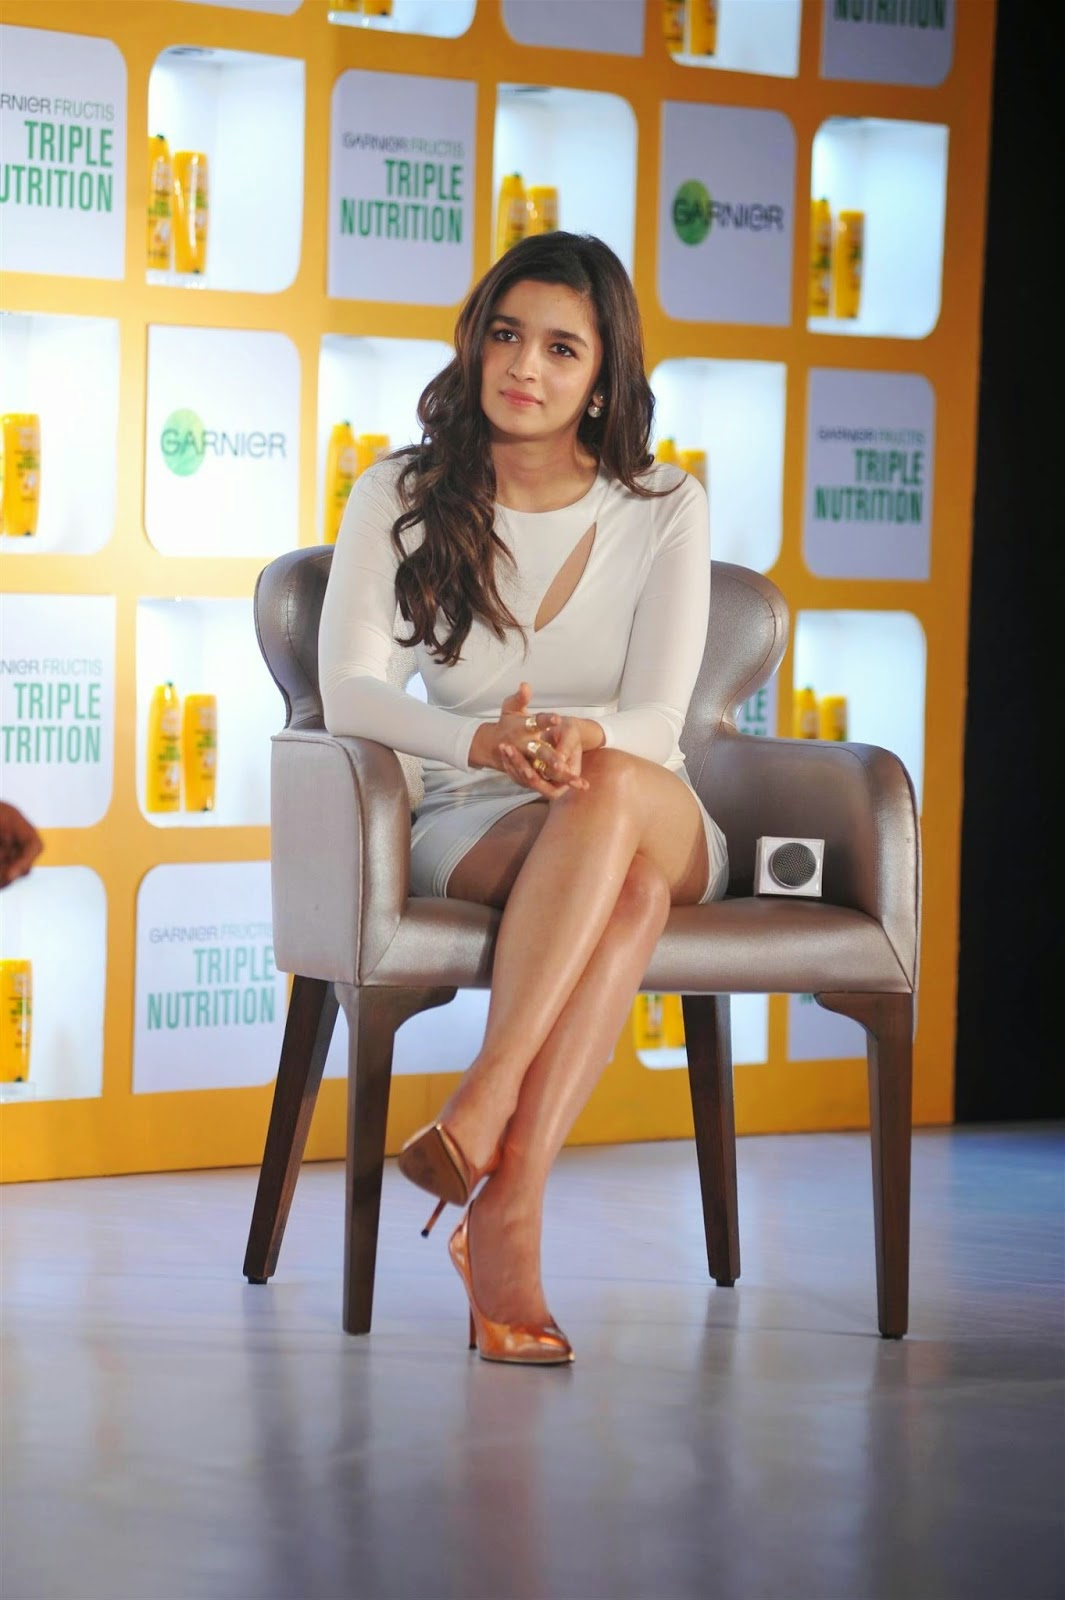 Alia bhatt's sexiest wardrobe malfucntion unseen rare HD hot pics